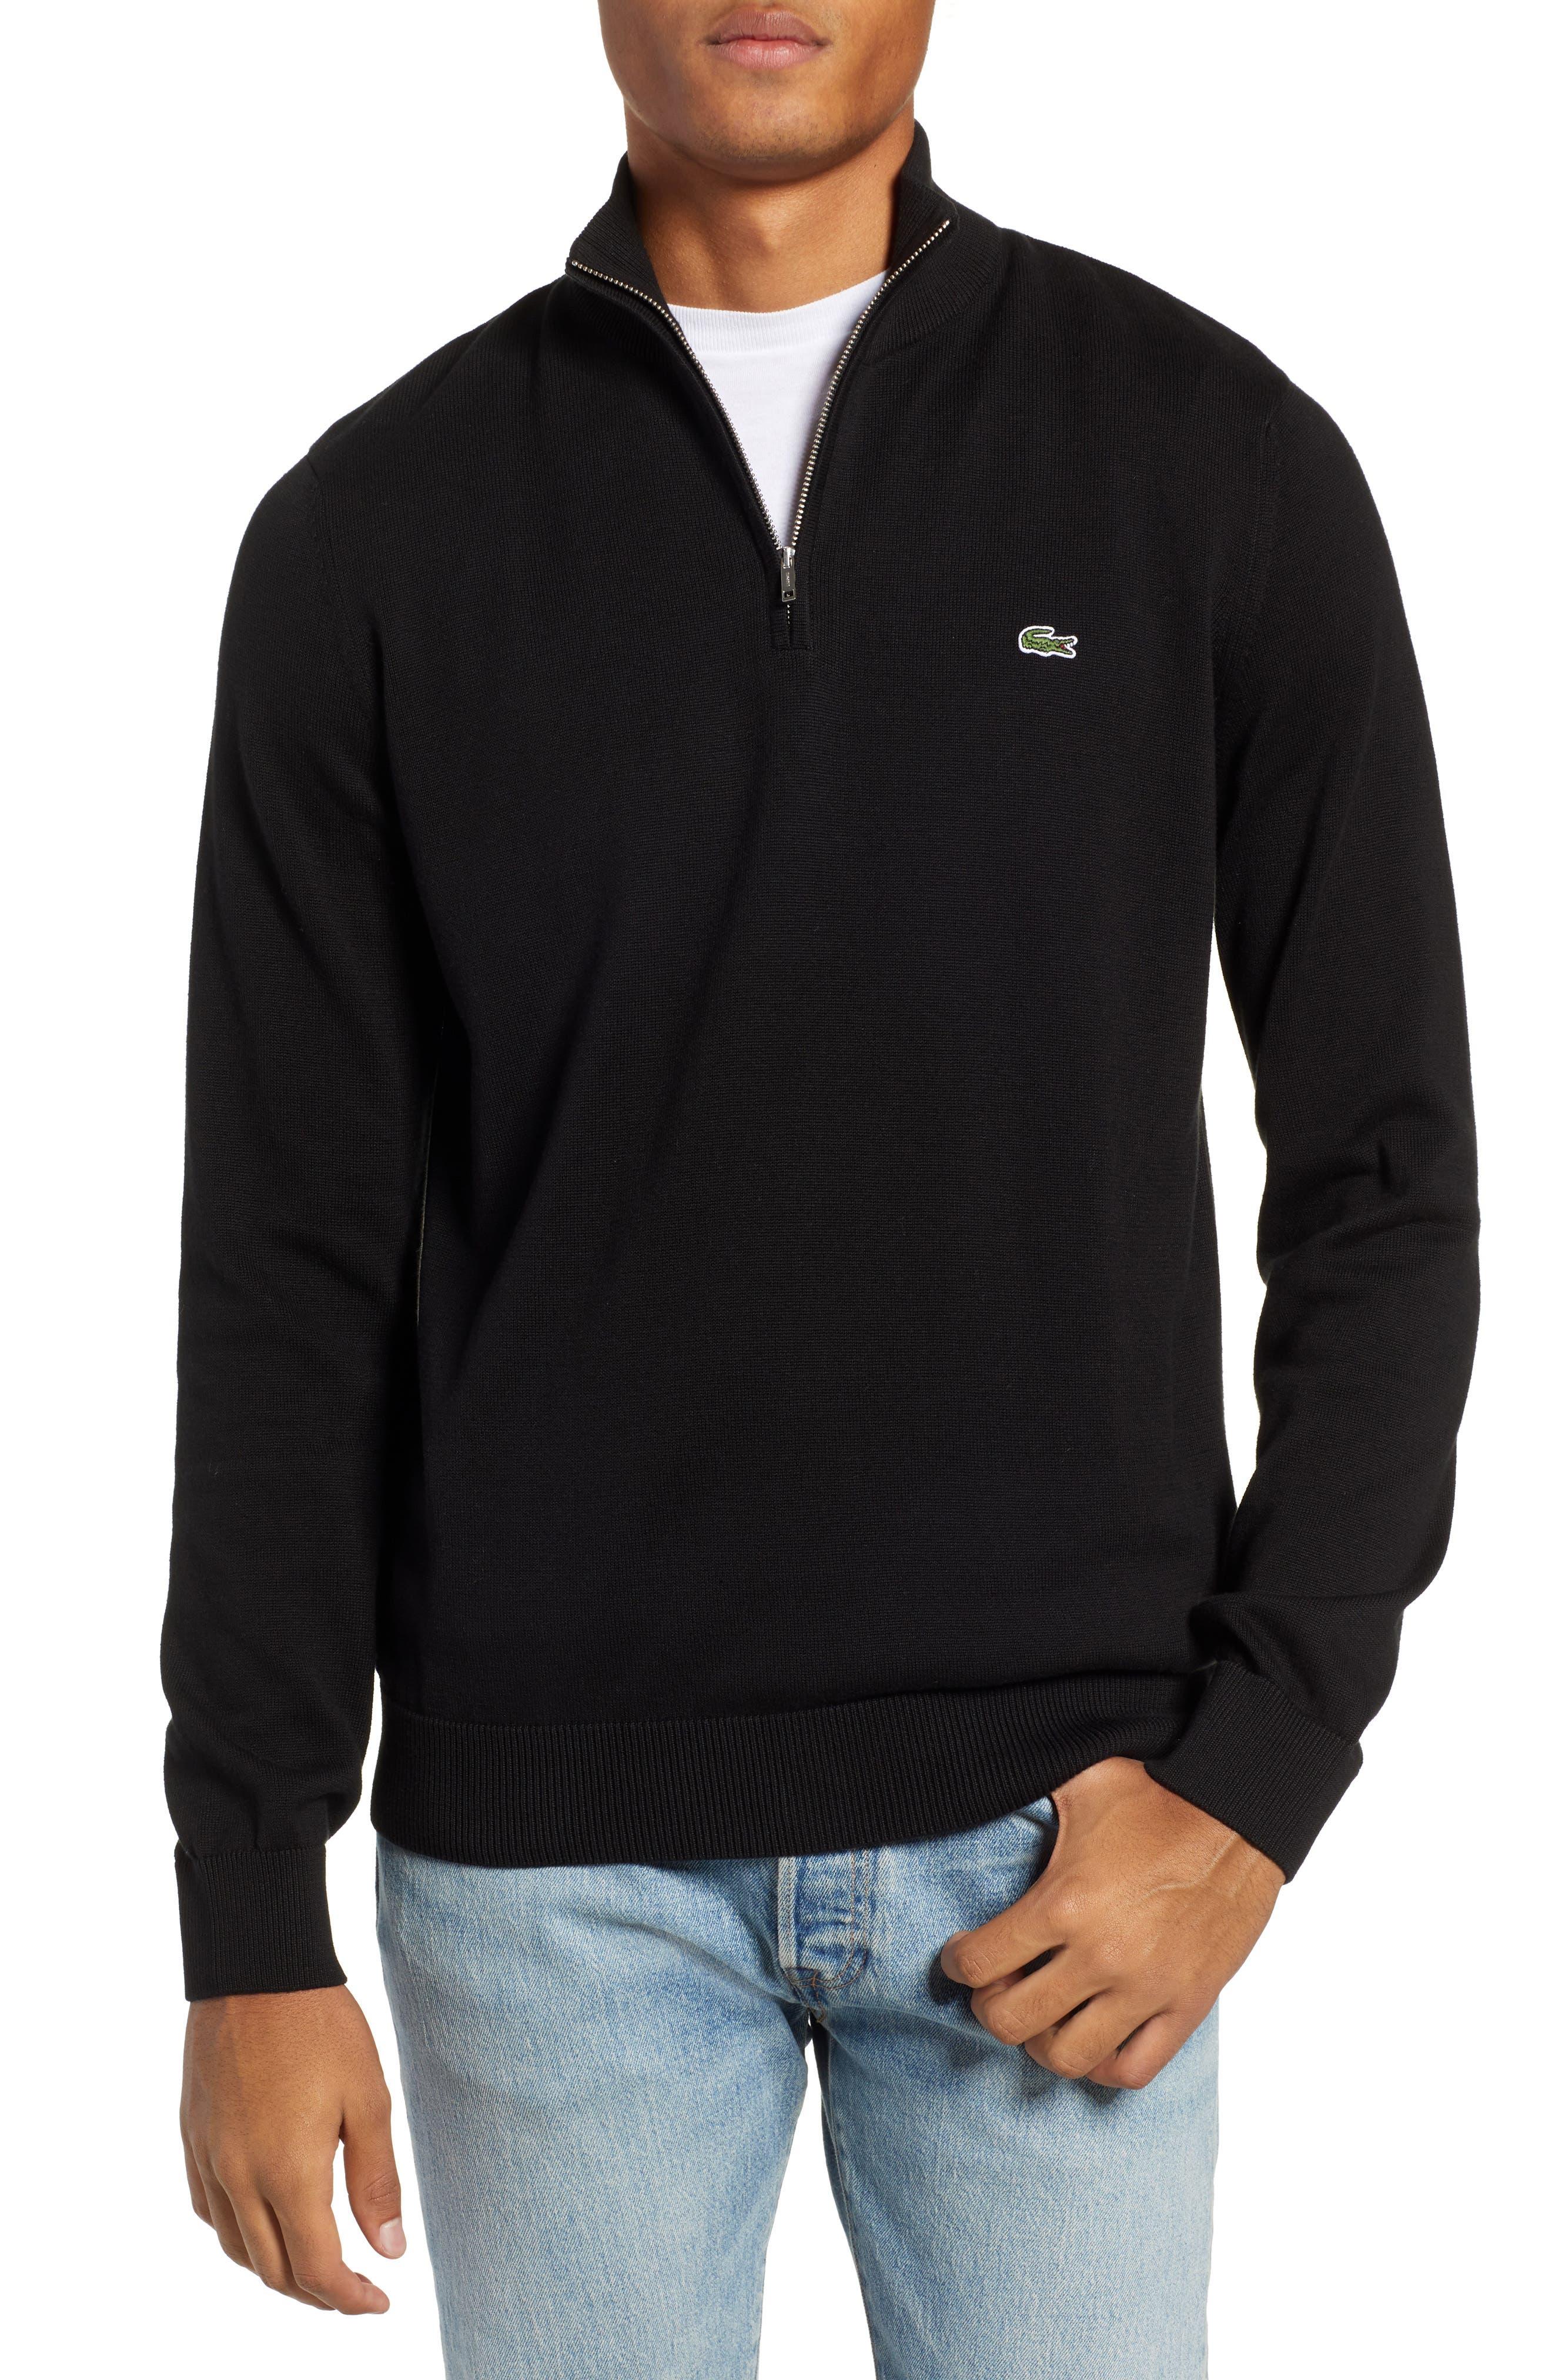 Quarter Zip Pullover,                         Main,                         color, 010